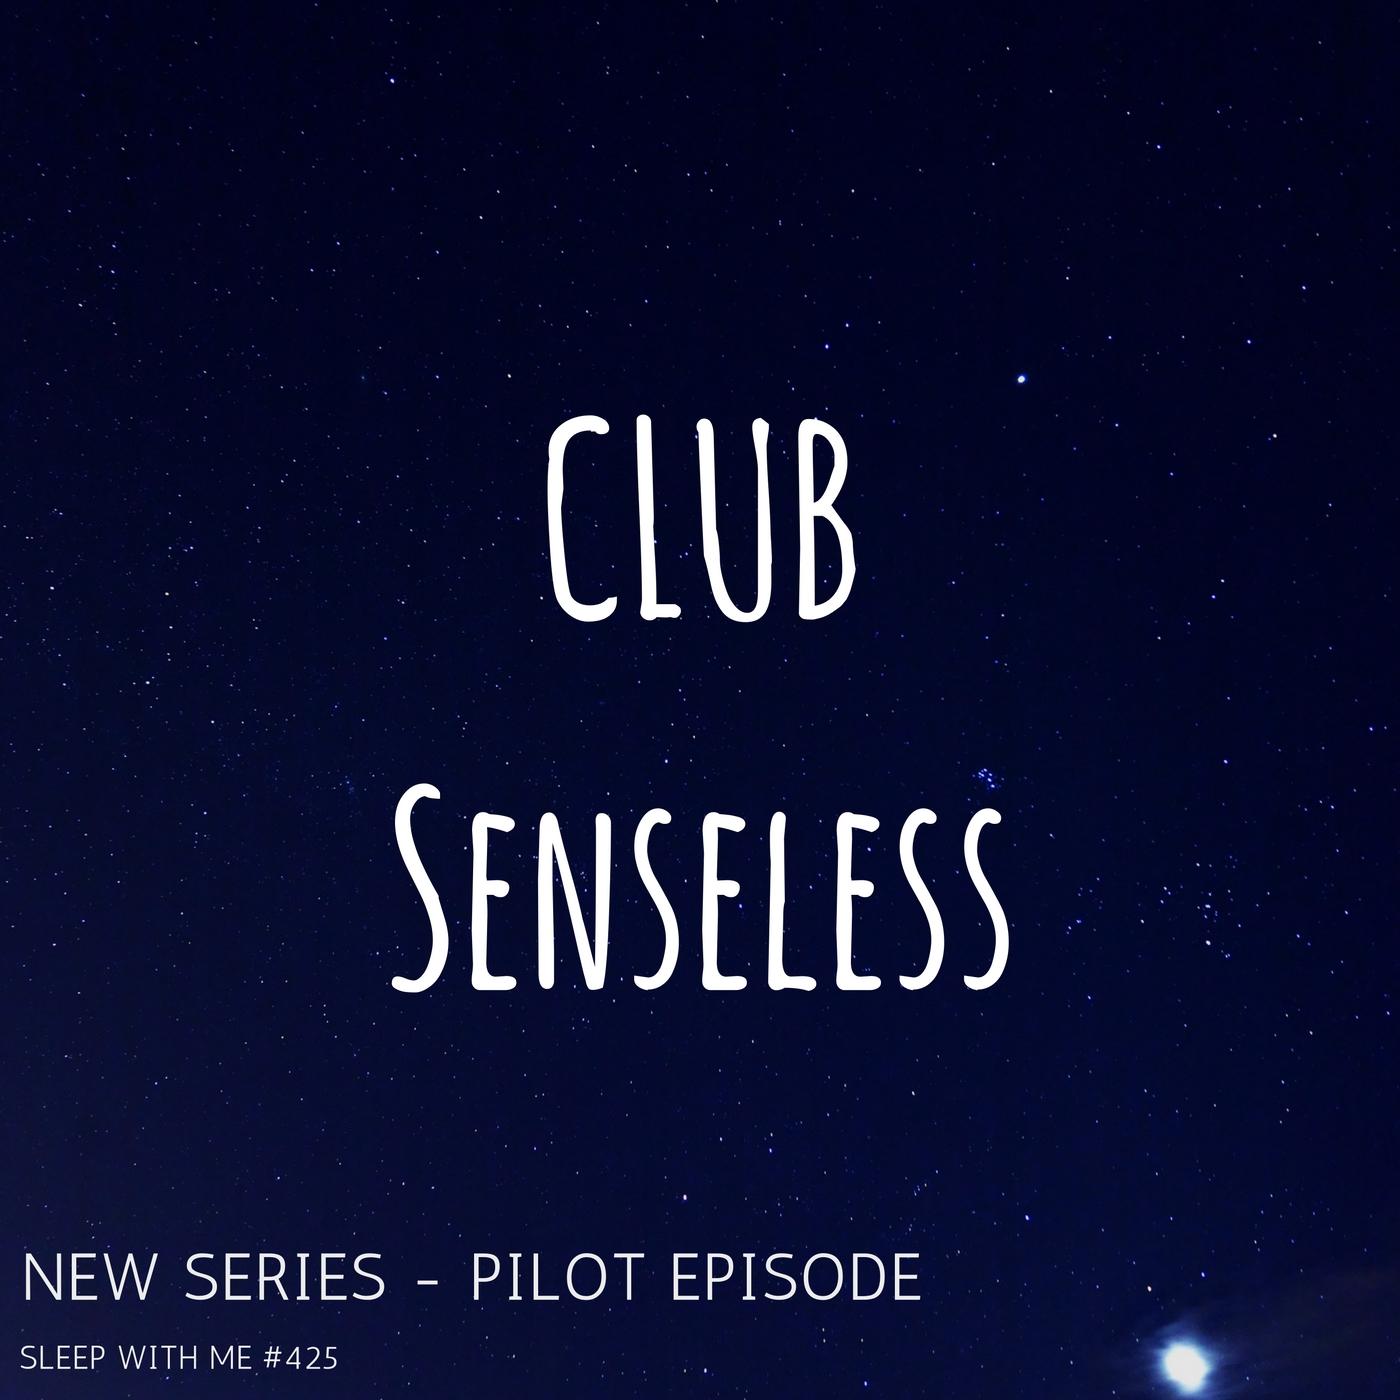 Club Senseless | New Series Pilot Episode | Sleep With Me #425